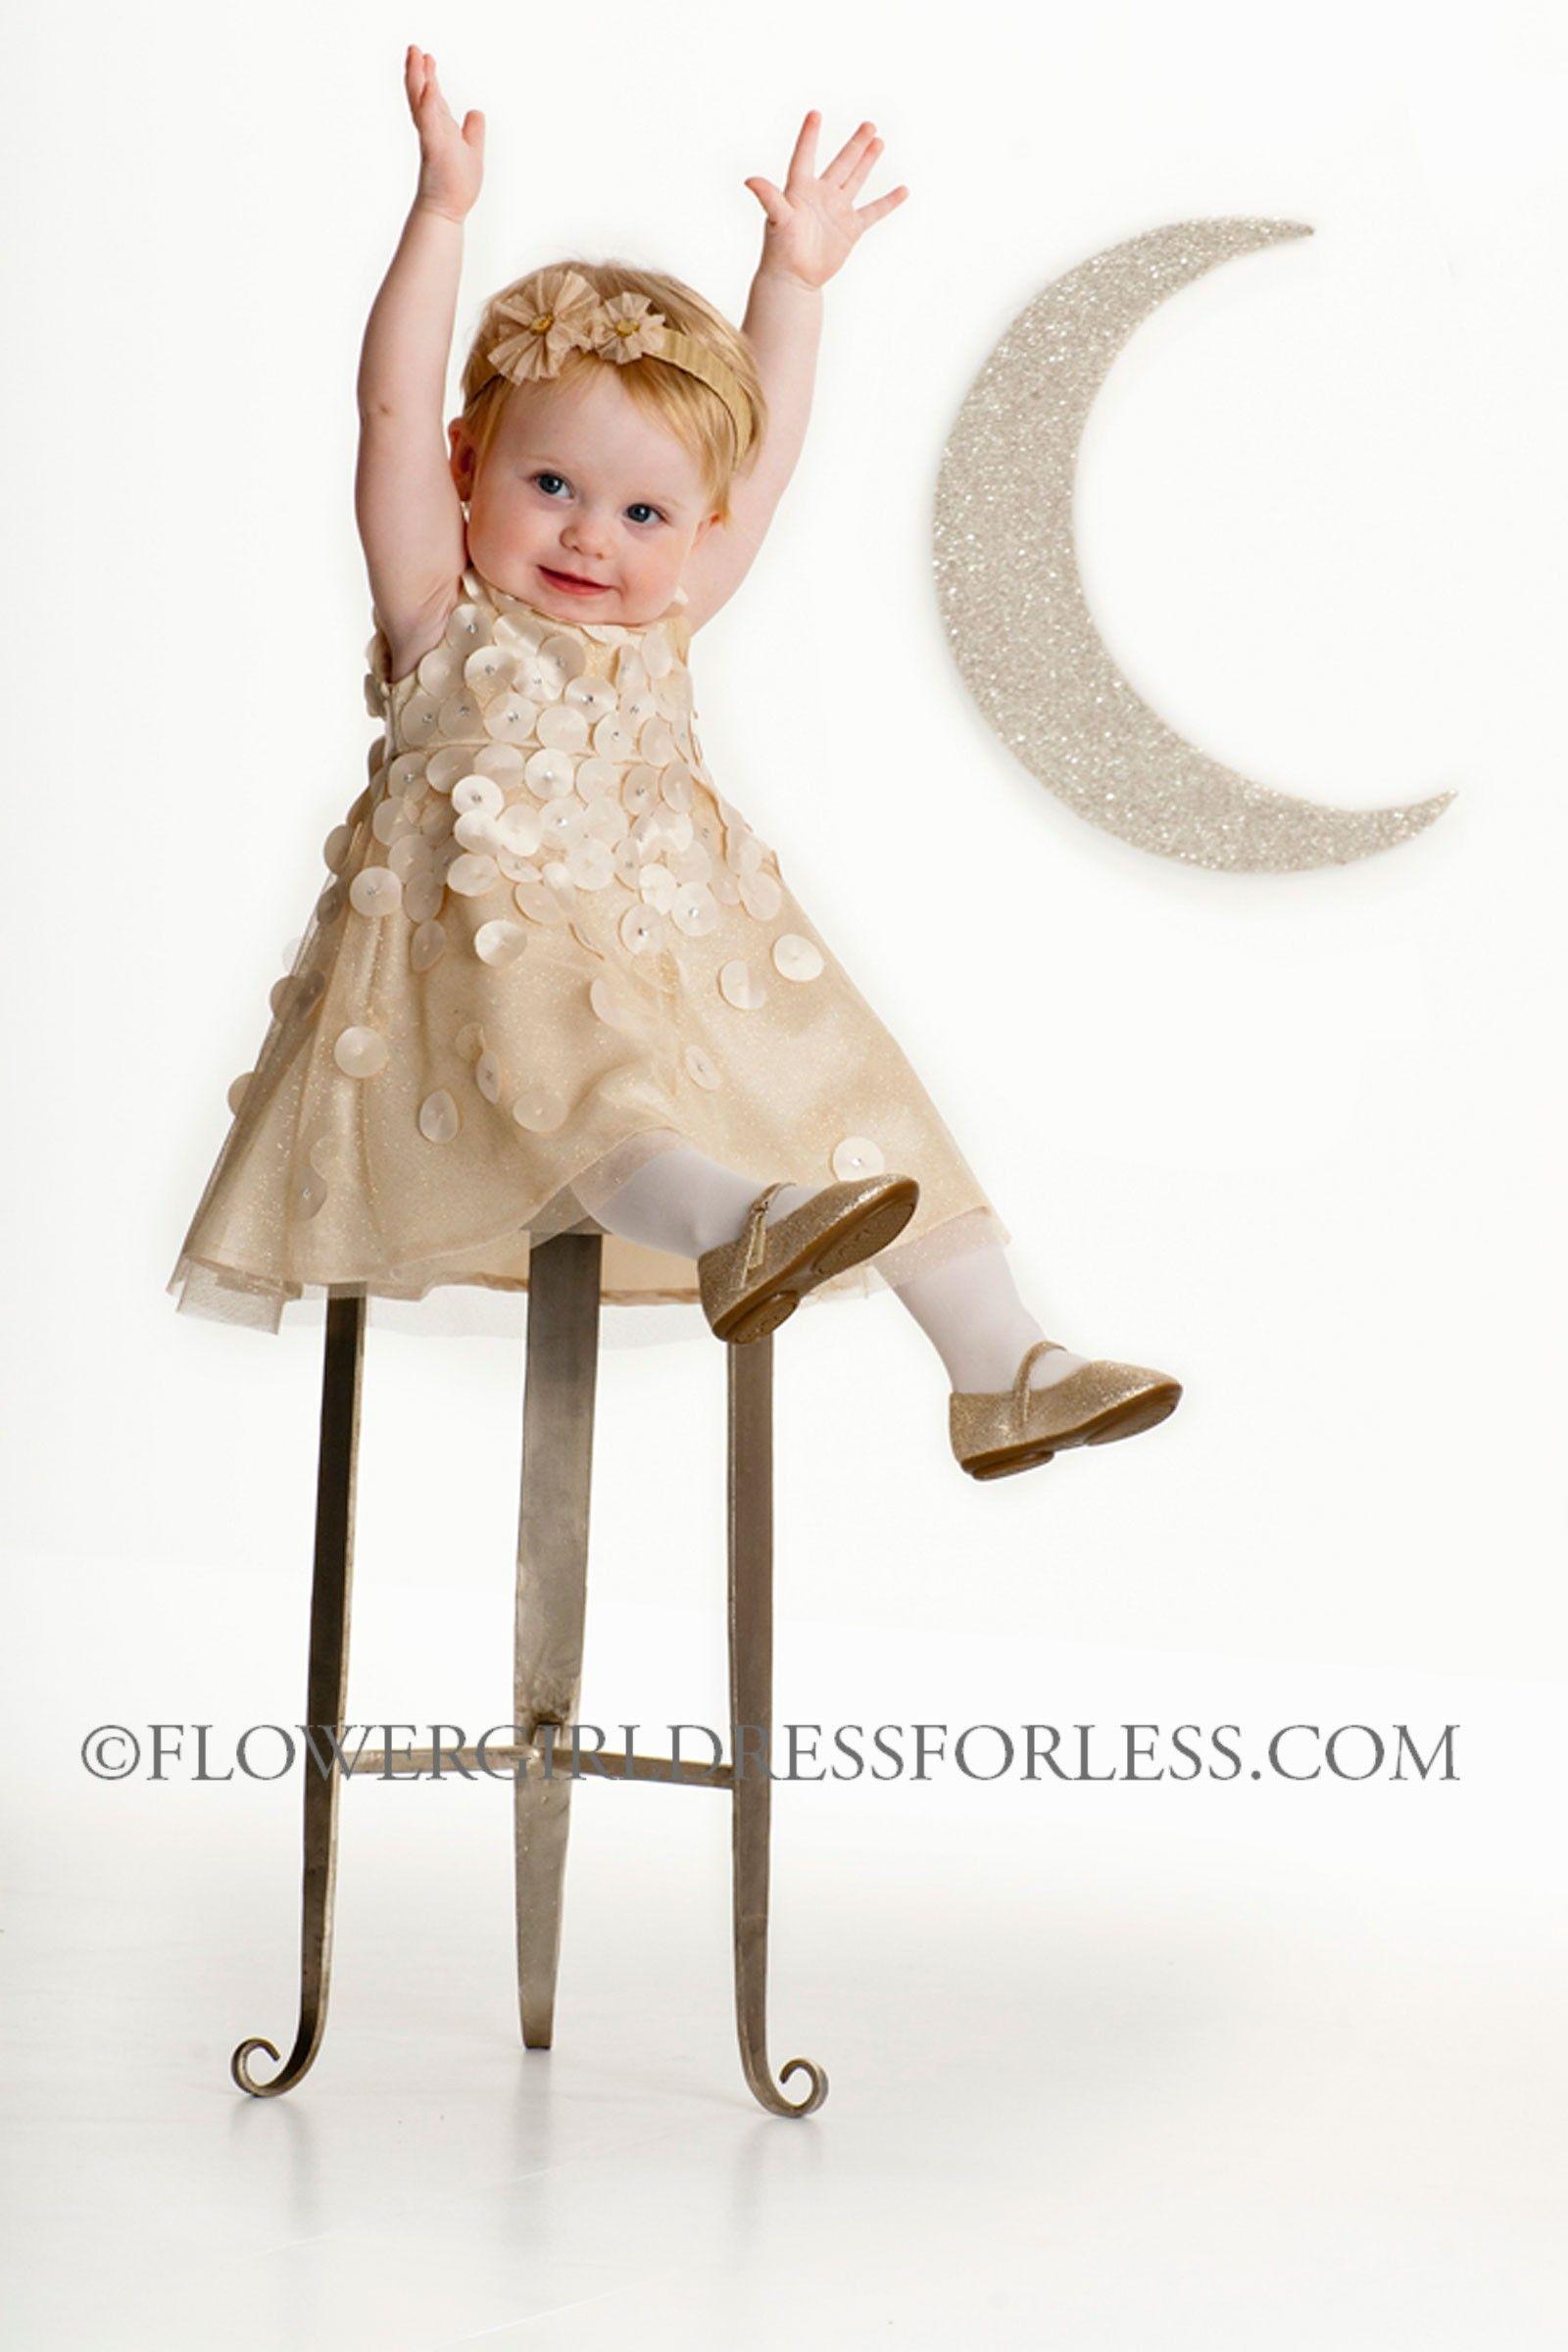 Biscotti designer girls dress style gold sleeveless glitter